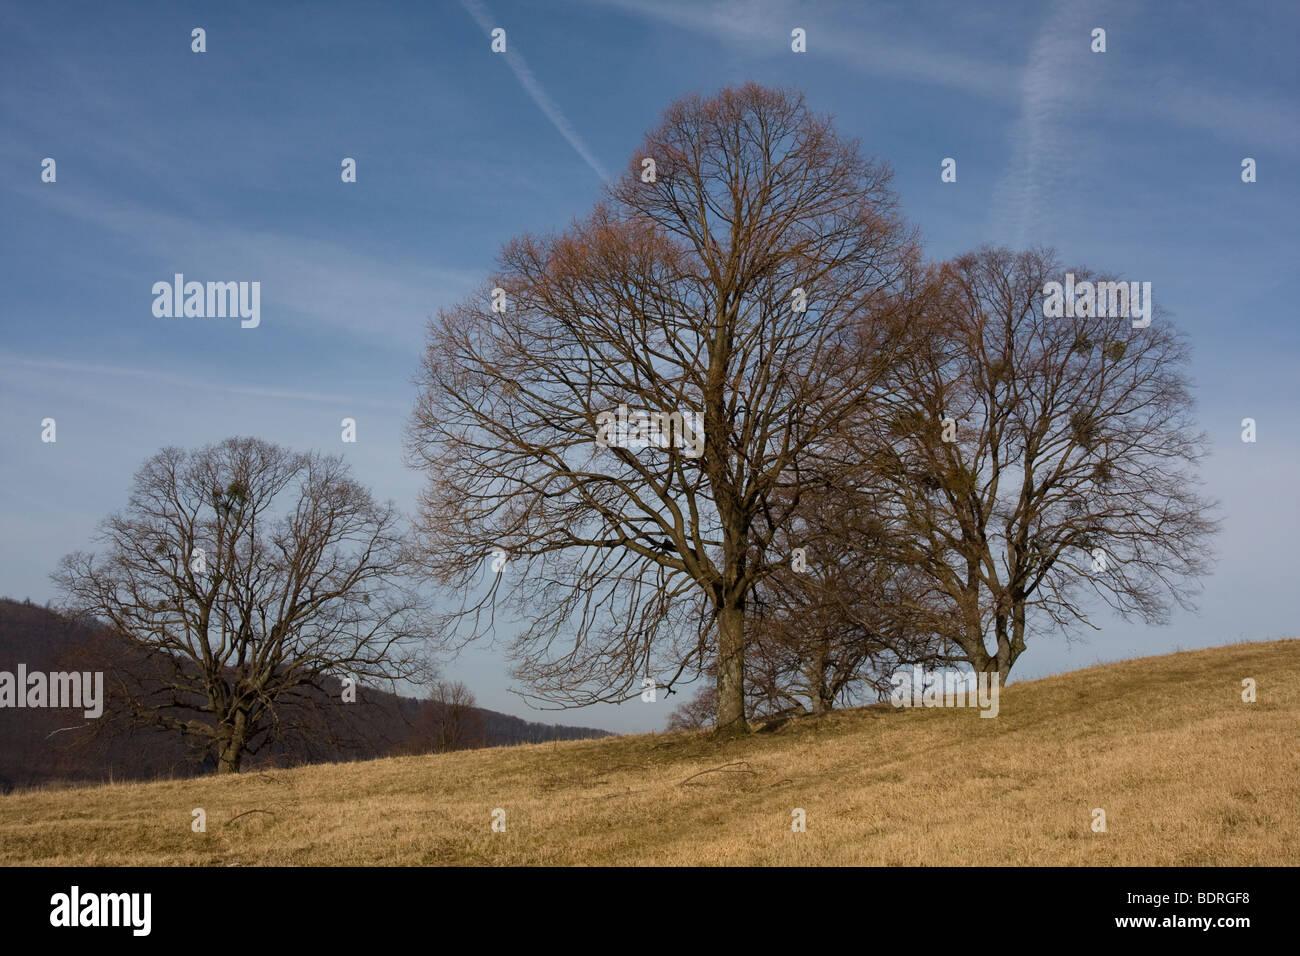 baum, baeume, misteln, Fruehling, teck, schwaebische alb, deutschland, tree, trees, mistletoes, spring, germany - Stock Image